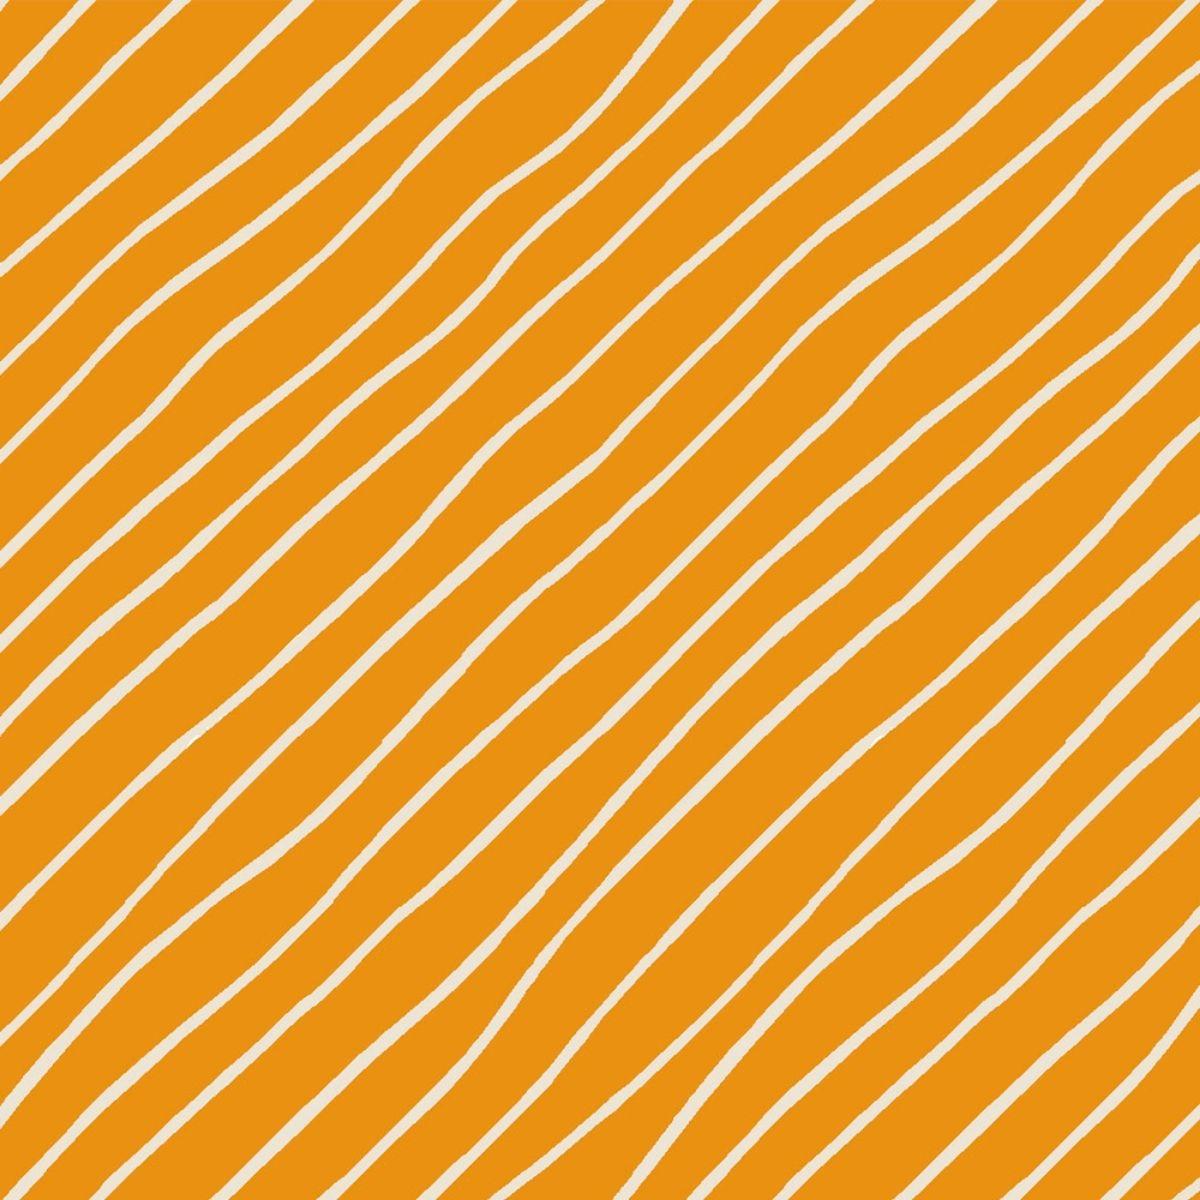 Tecido Tricoline 100% Algodão 0,50 cm x 1,50 m de Largura - Fall'In Love